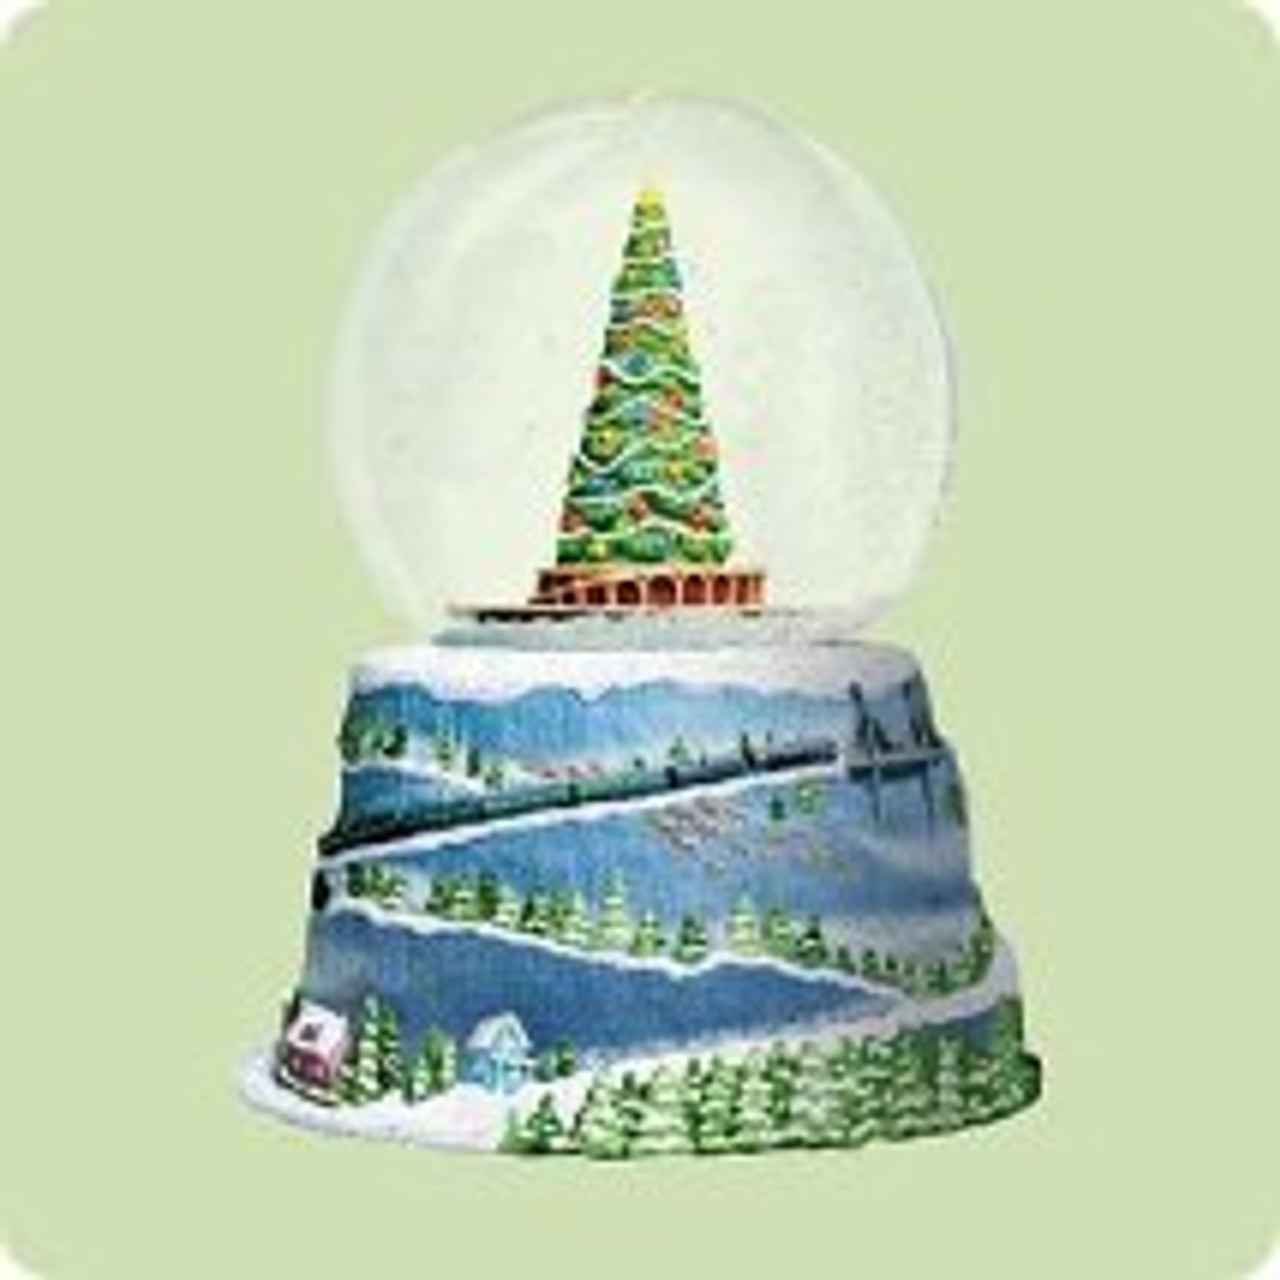 Pleasing 2004 Polar Express Snow Globe And Train Hallmark Ornament The Funny Birthday Cards Online Fluifree Goldxyz